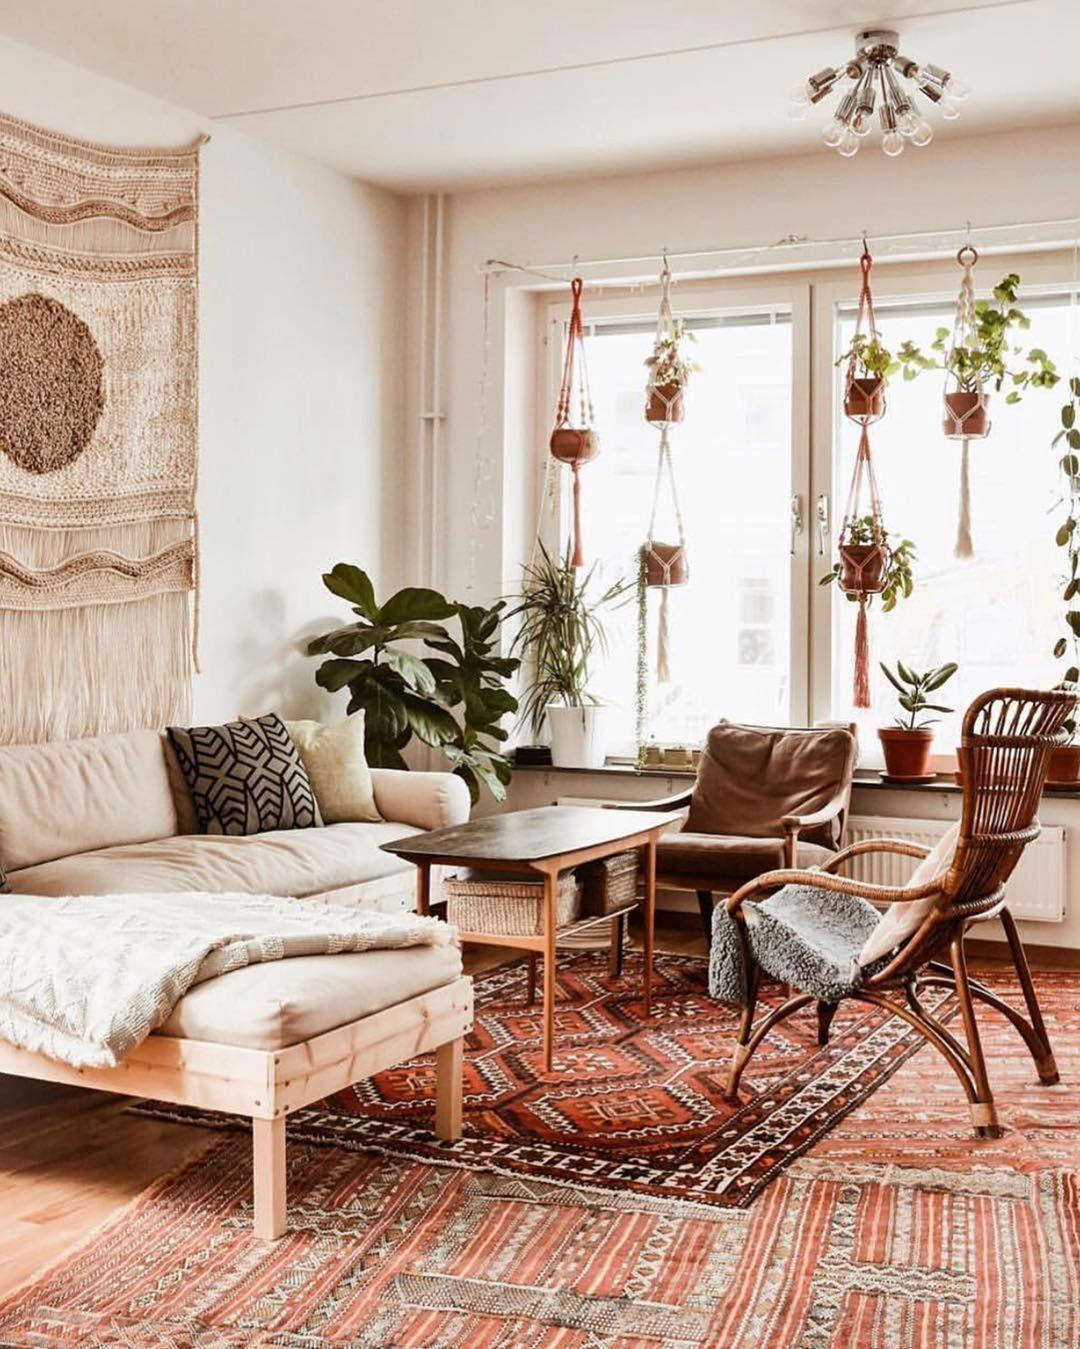 15 incredible bohemian living room decorating ideas to inspire you elegant living room boho on boho chic decor living room bohemian kitchen id=15744